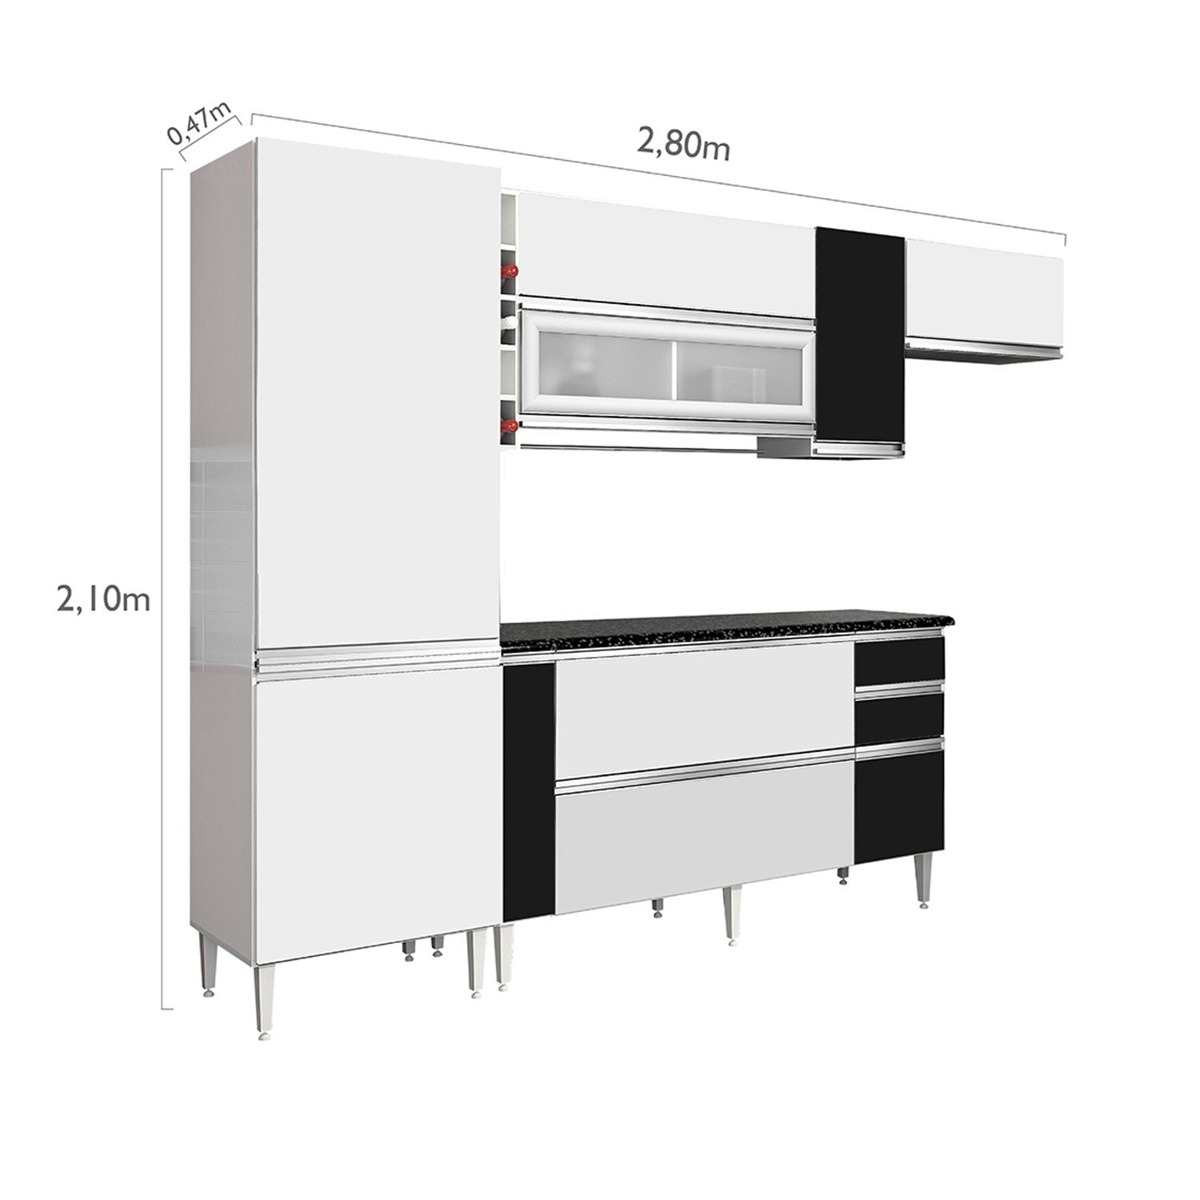 Cozinha Completa 4 Pe As Bano Chf Branco Preto Cfwt R 1 199 90